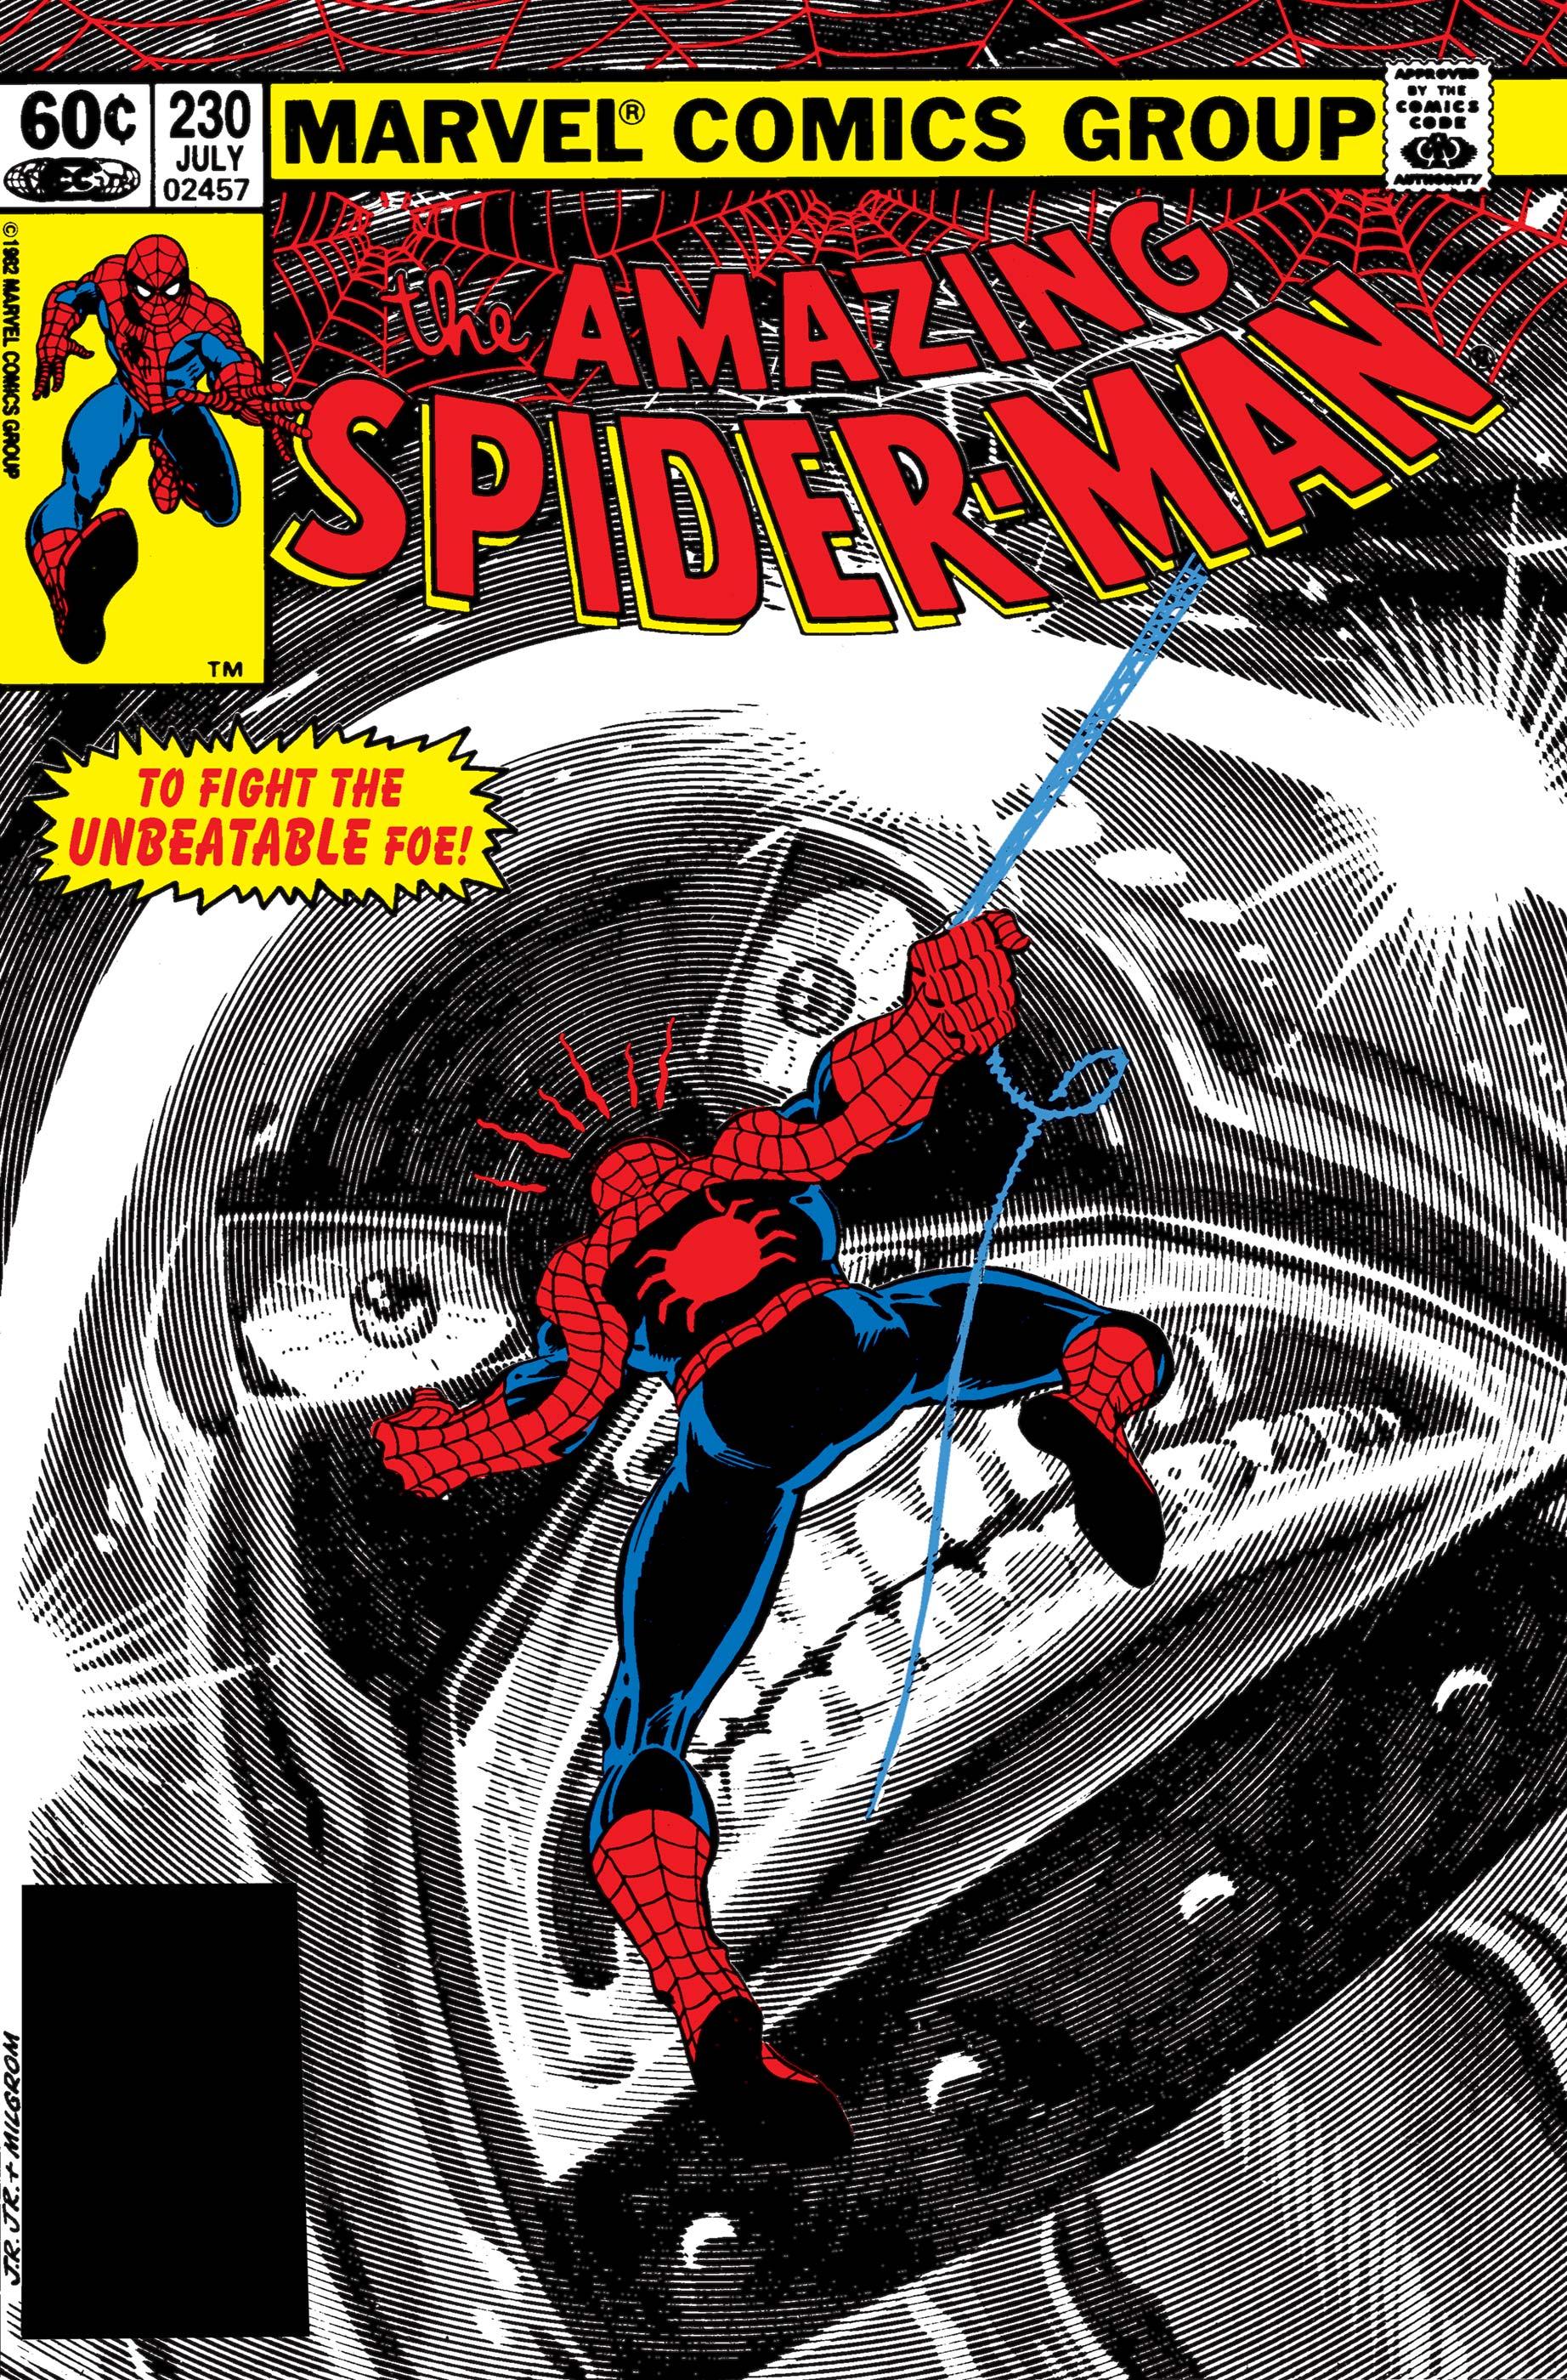 The Amazing Spider-Man (1963) #230